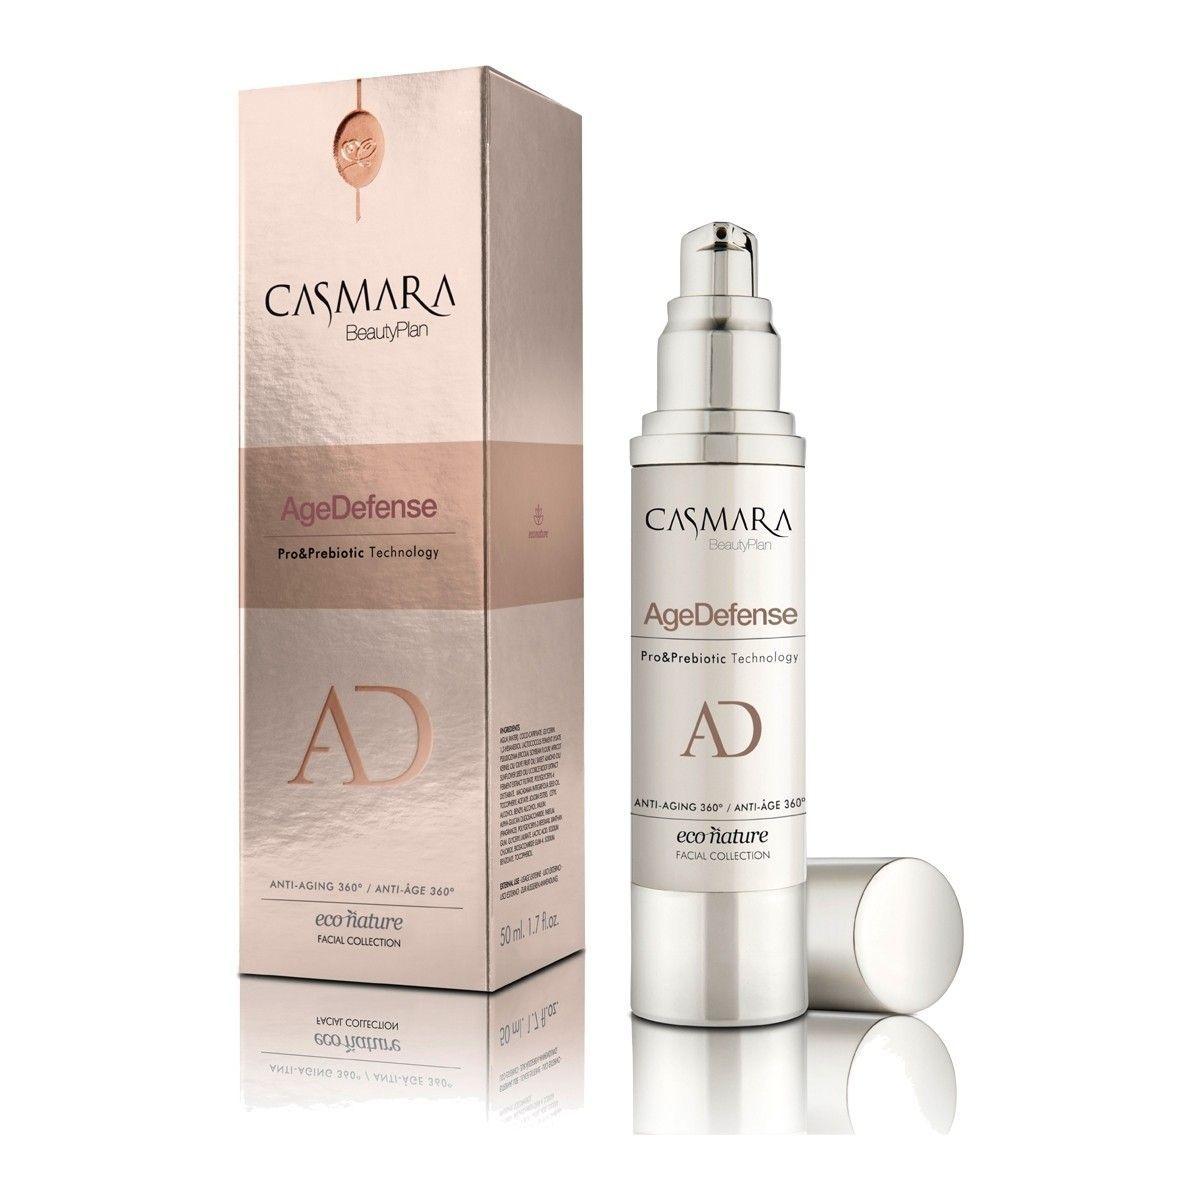 Afbeelding van Casmara Age Defense Cream 50Ml Beauty